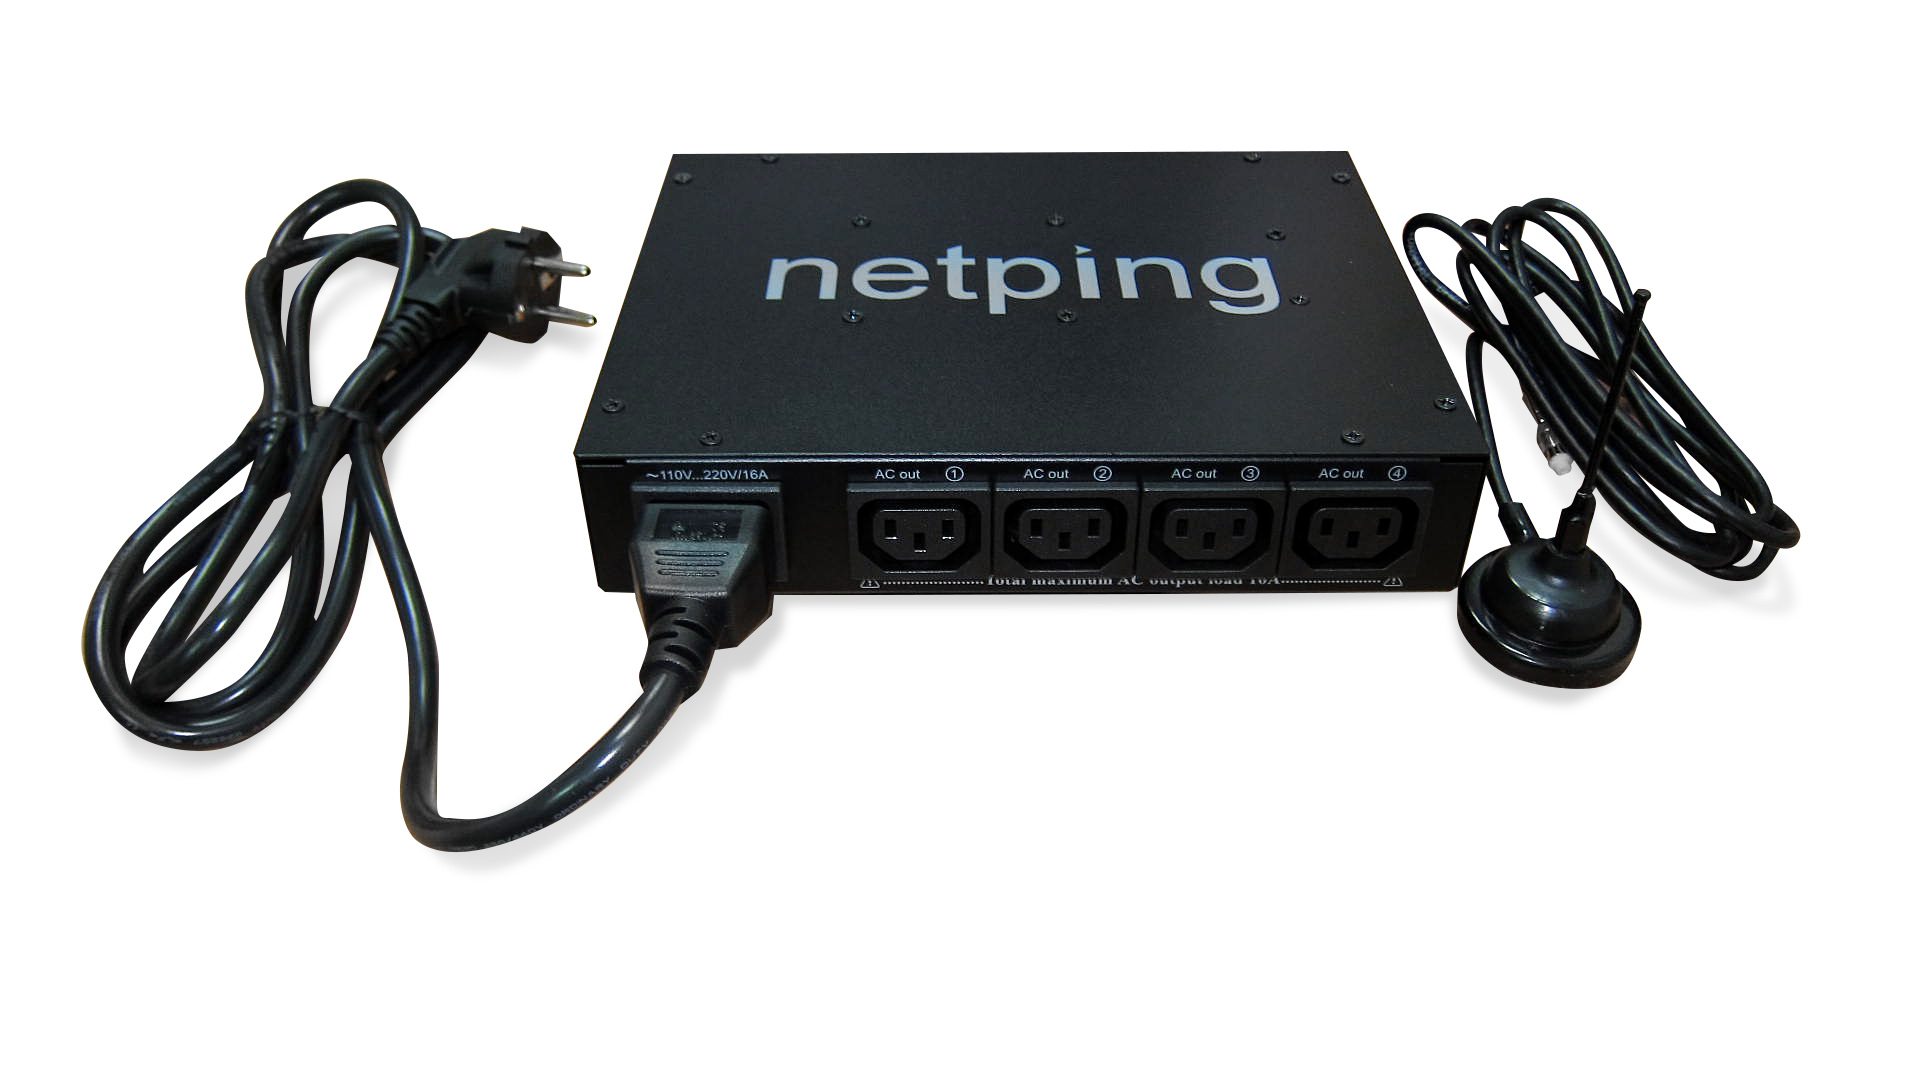 NetPing 4PWR-220 v3SMS